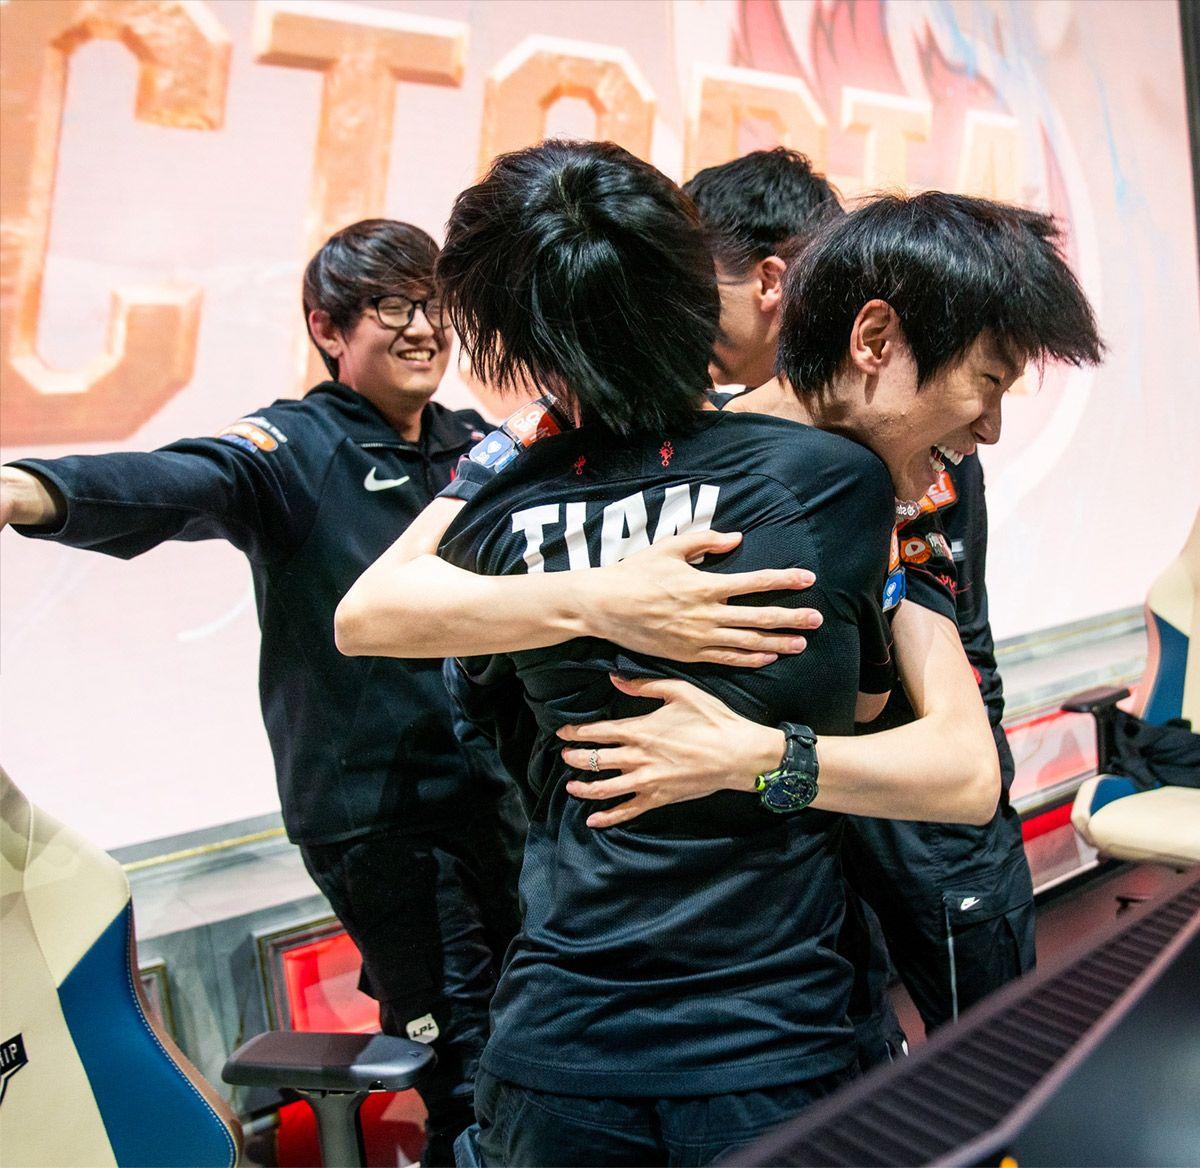 FPX wins League of Legends World Championship